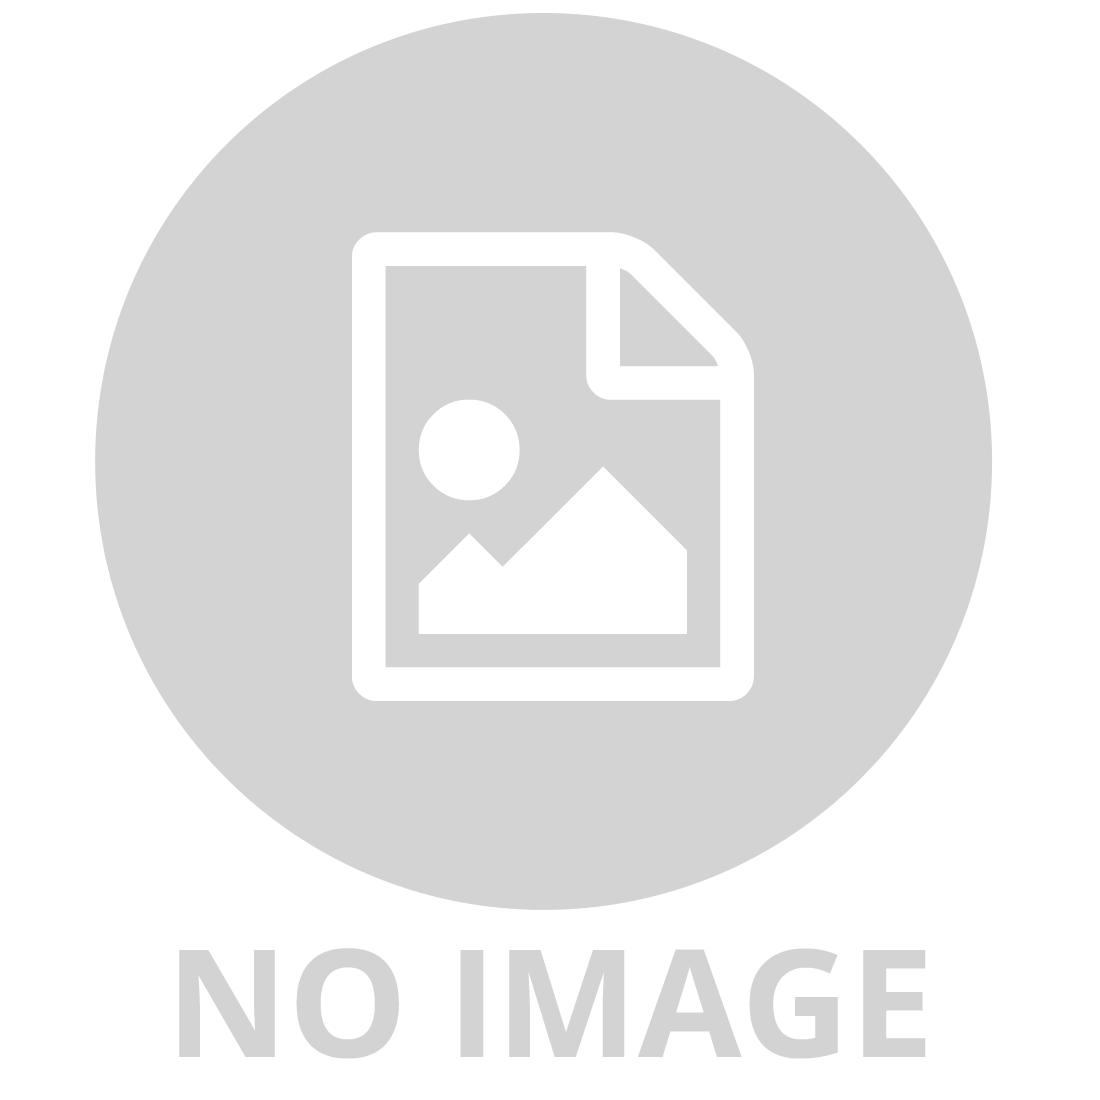 LEGO STAR WARS MICROFIGHTER 75193 MILLENNIUM FALCON